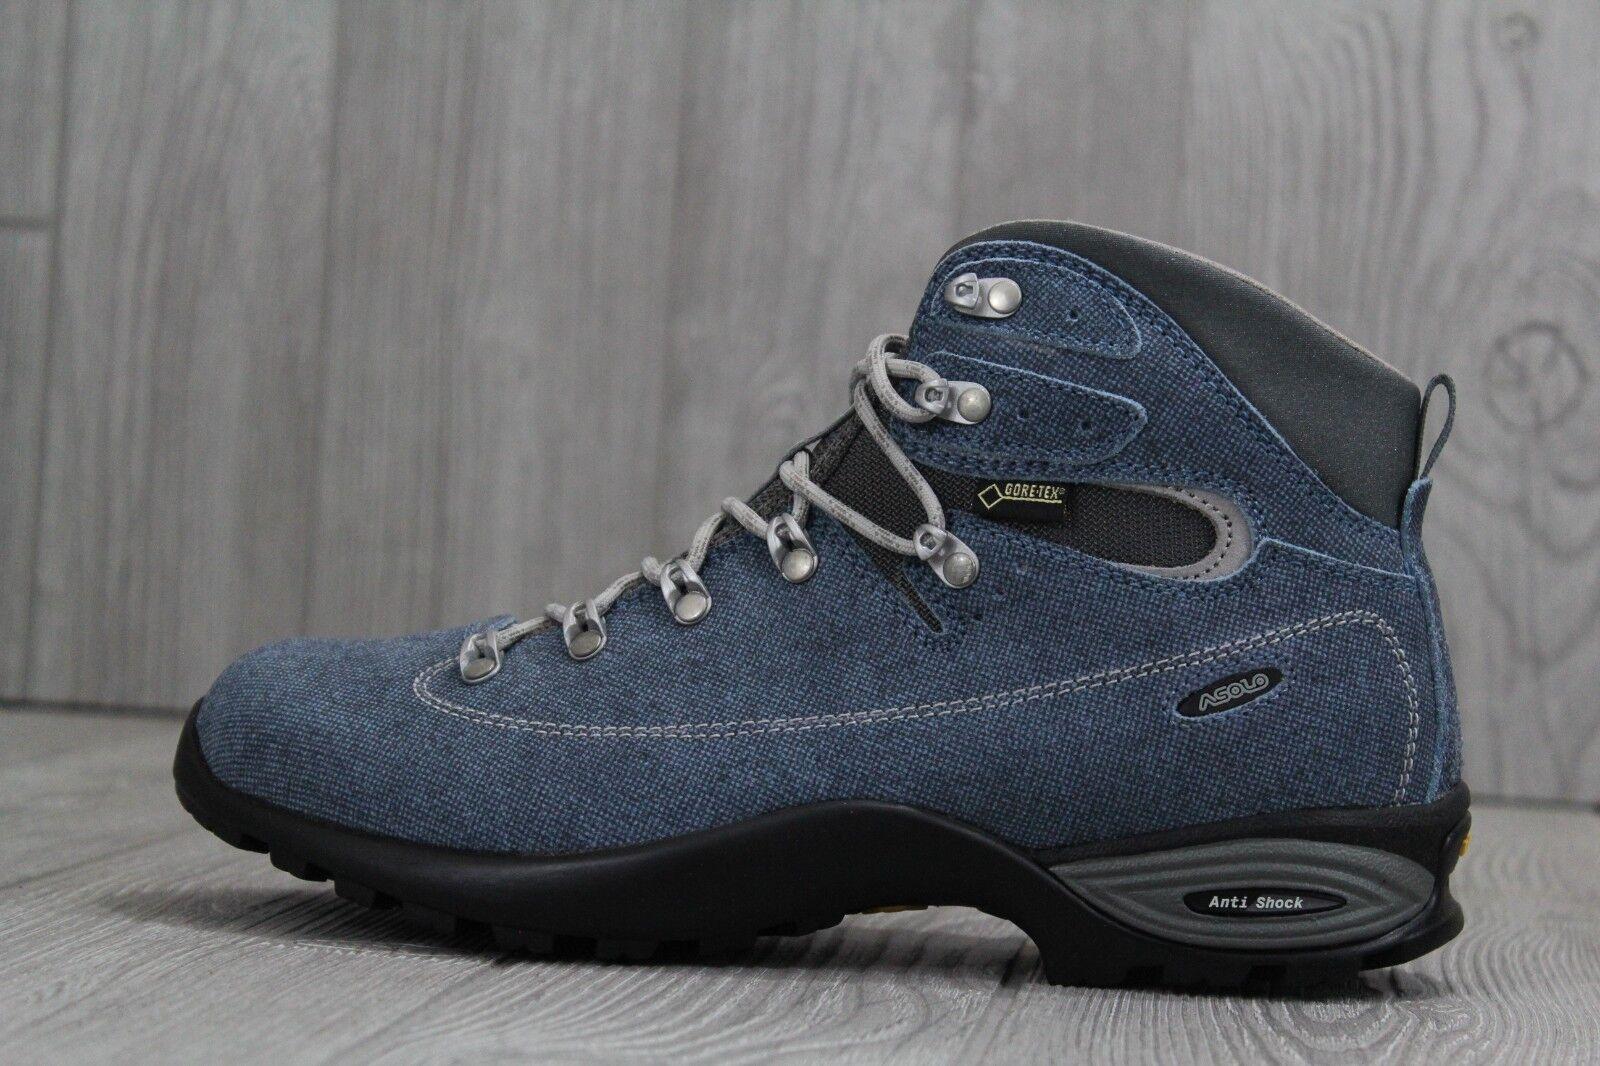 31 Asolo Tacoma GV Gore-Tex GTX Vibram Hiking Boots bluee Grey Womens Sz 7.5 - 10